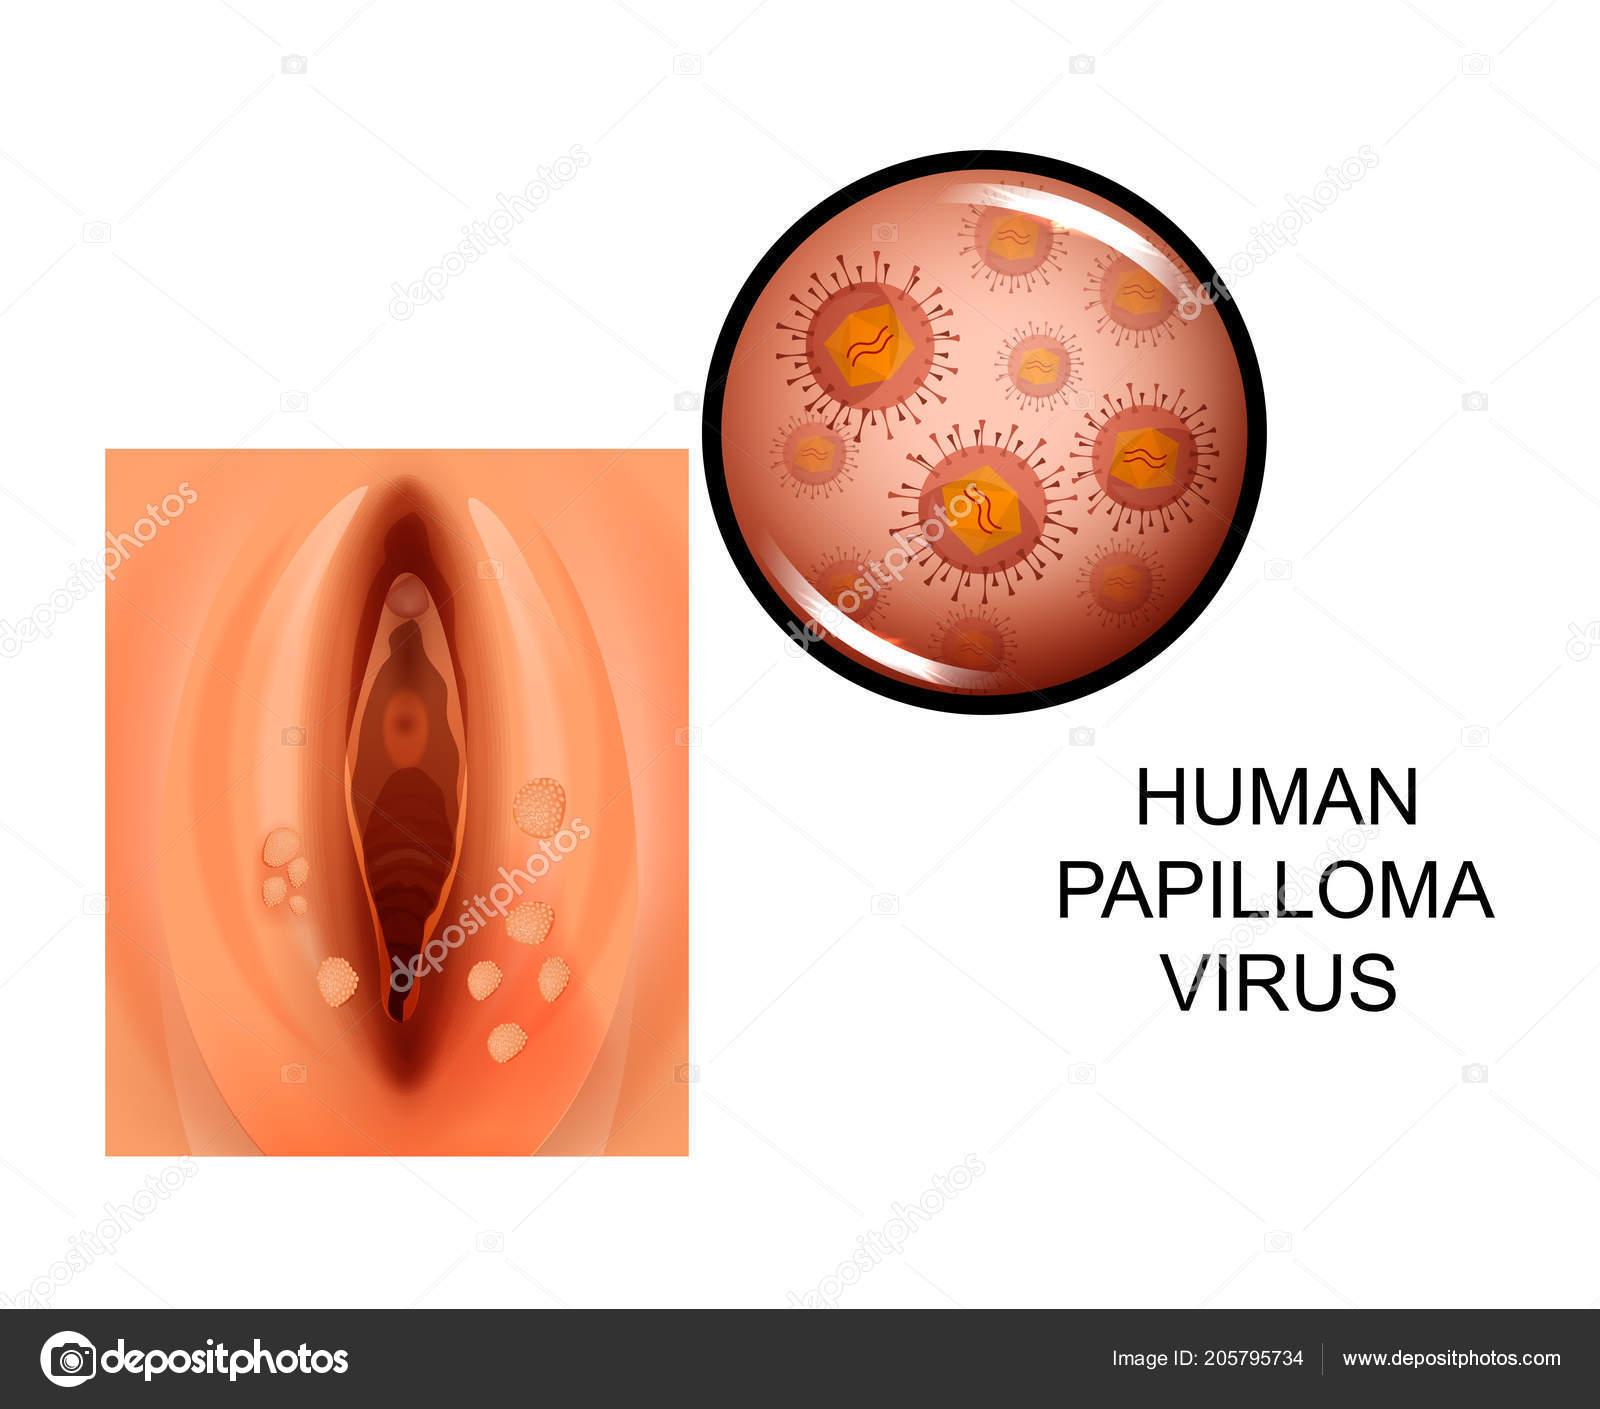 humán papillomavírus po polsku vírusos papilloma icd 10